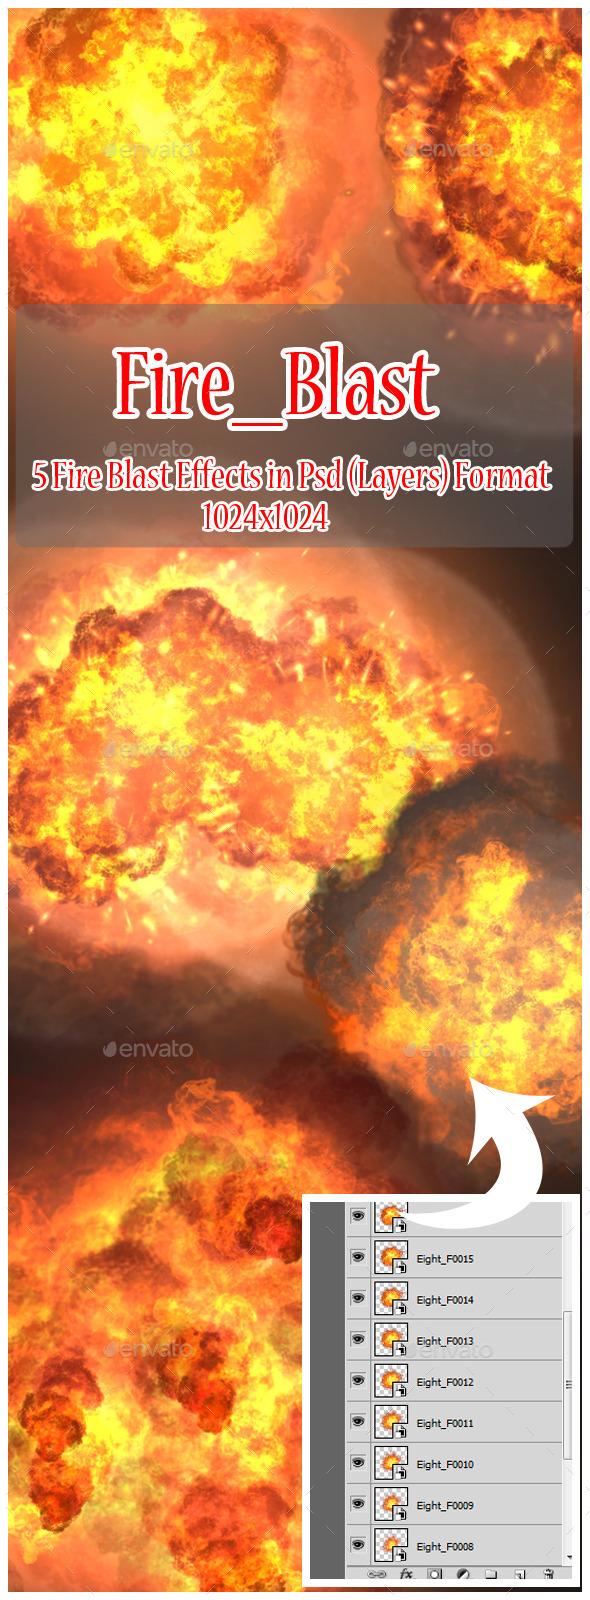 Fire Blast - Miscellaneous Backgrounds